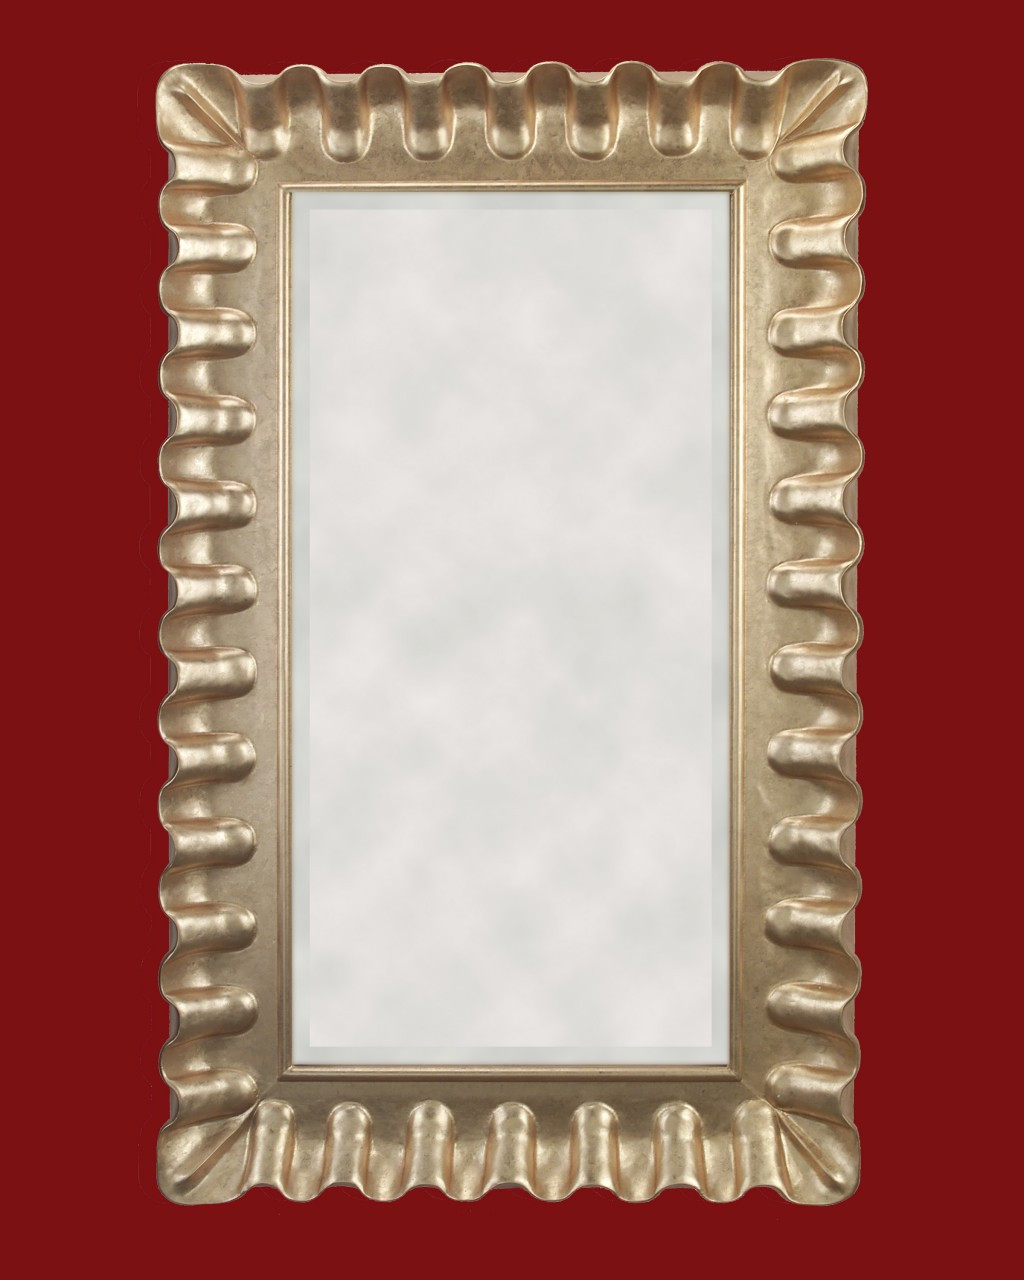 Hand Carved Frame Gold Metal leaf, art size is 24 x 48 inch